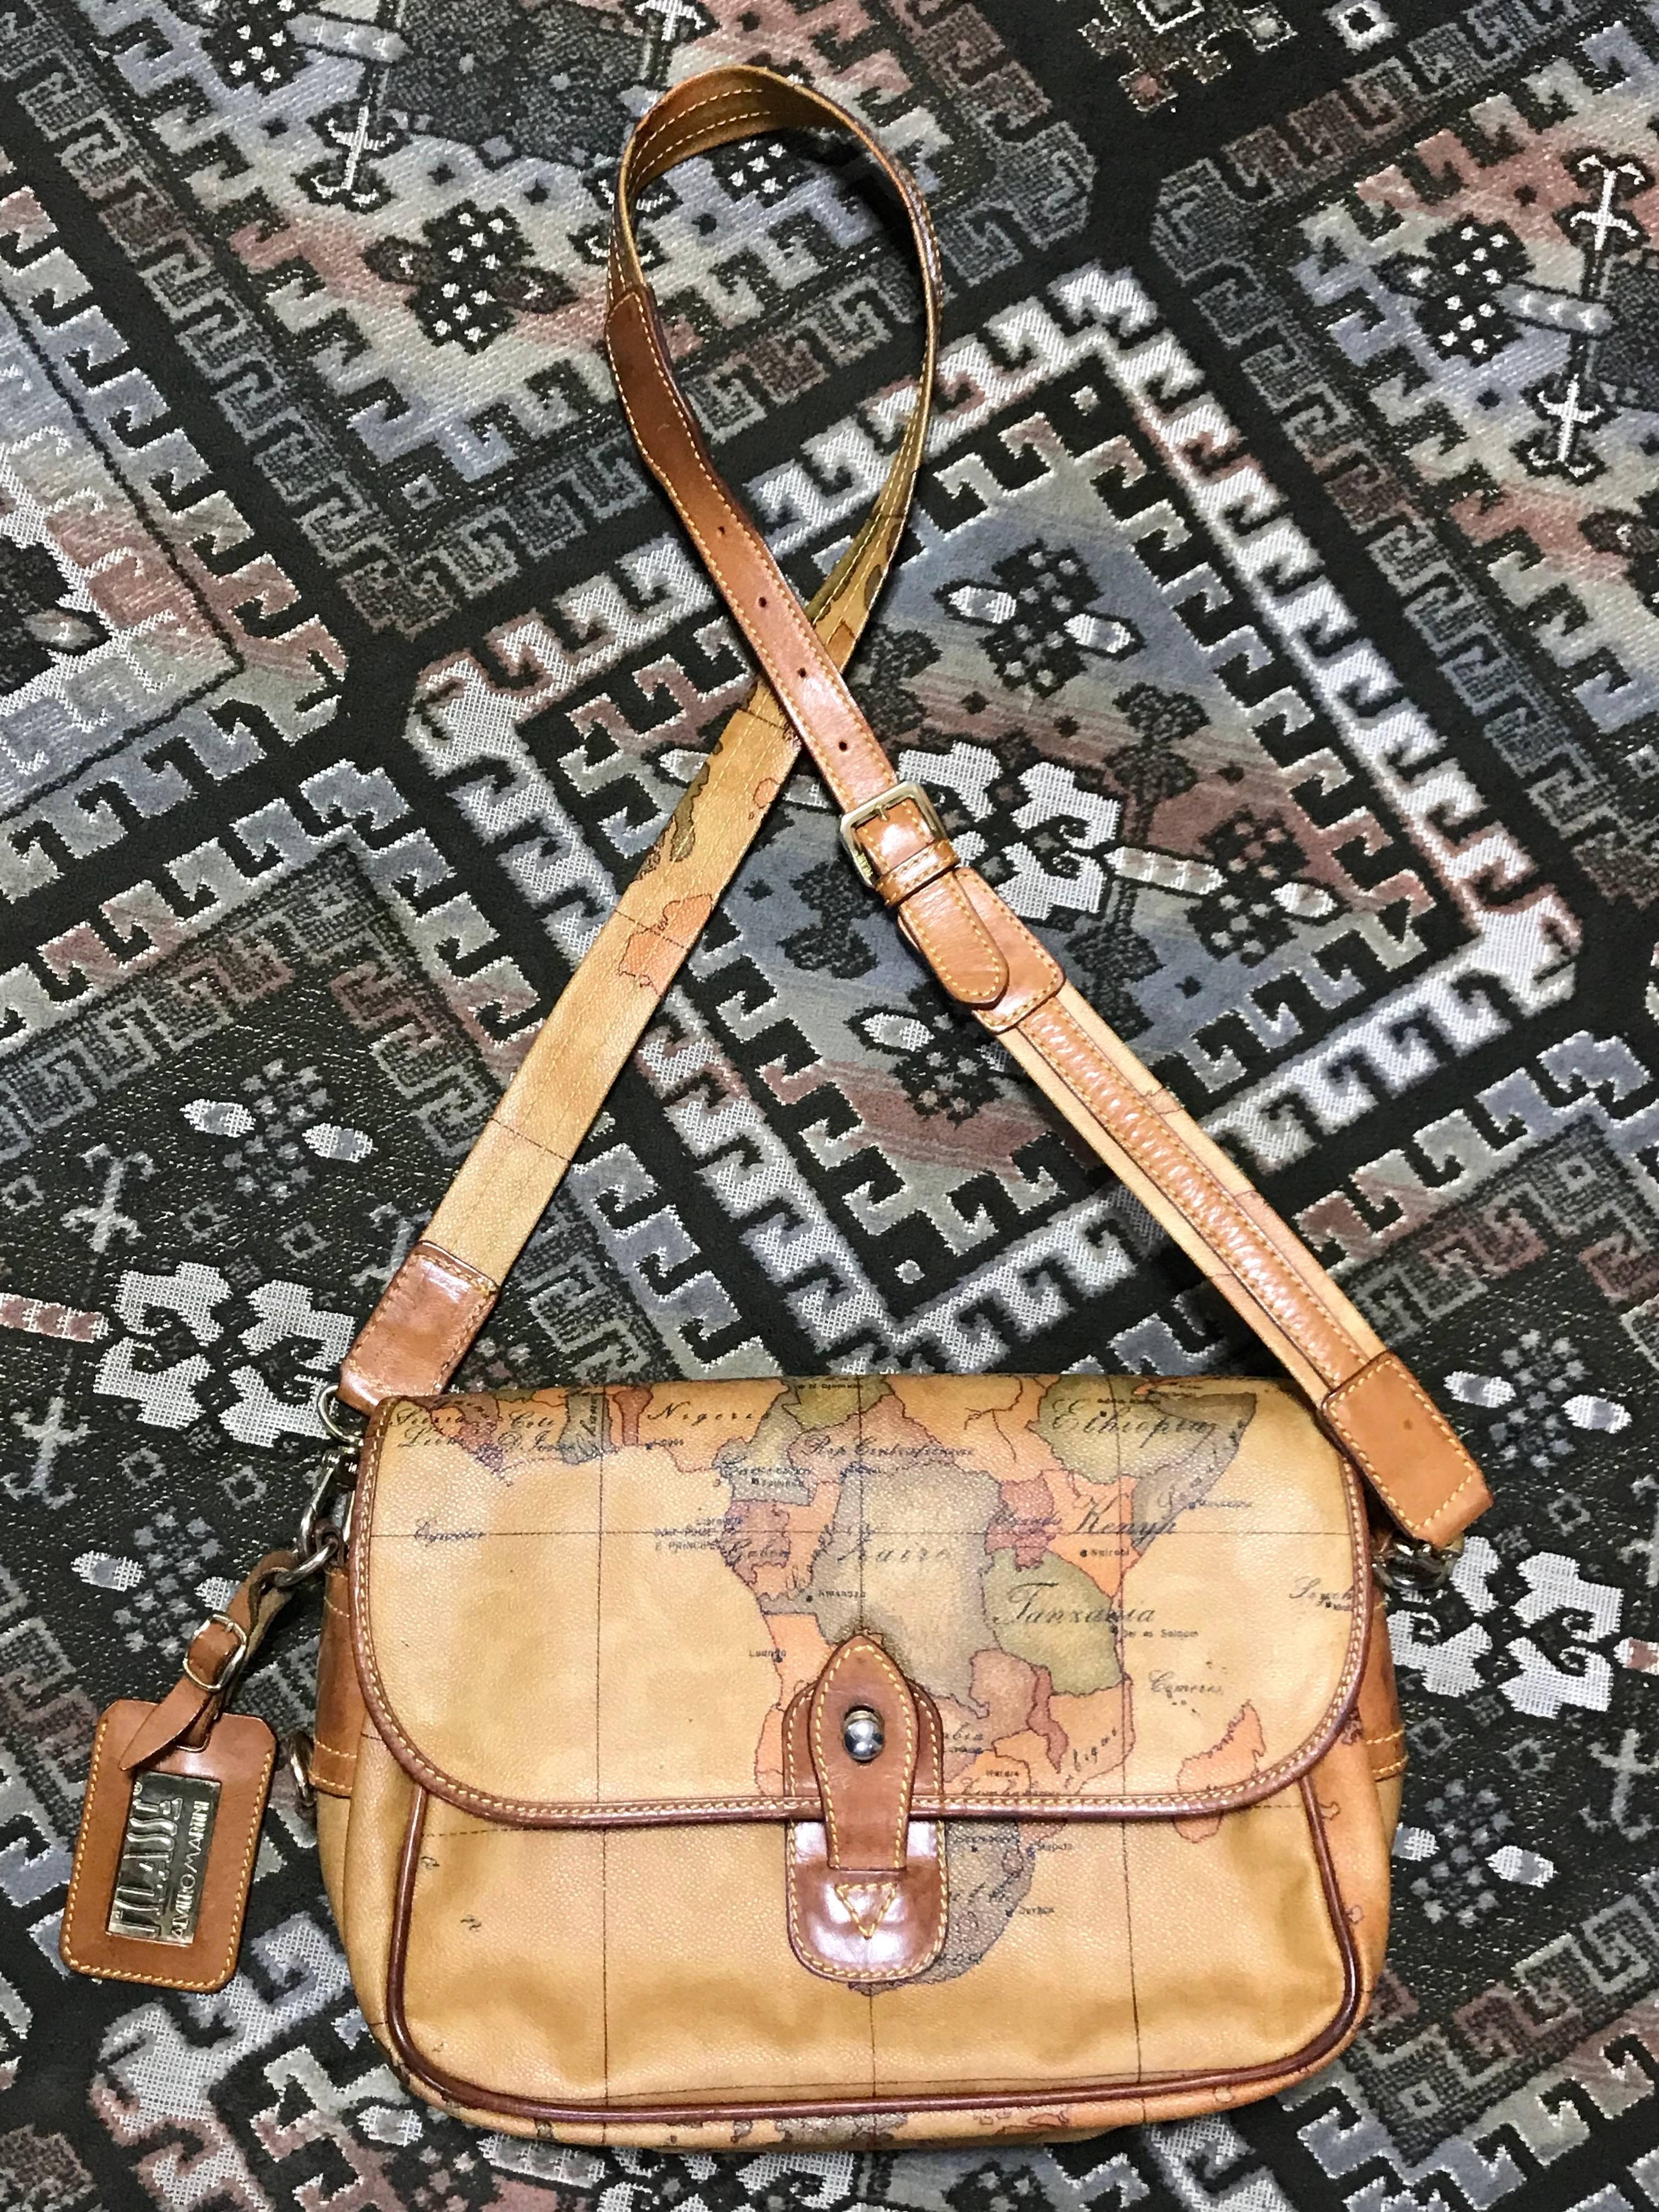 1stdibs Alviero Martini Prima Classe Vintage Messenger Type Classic Shoulder Bag b65eHb8V